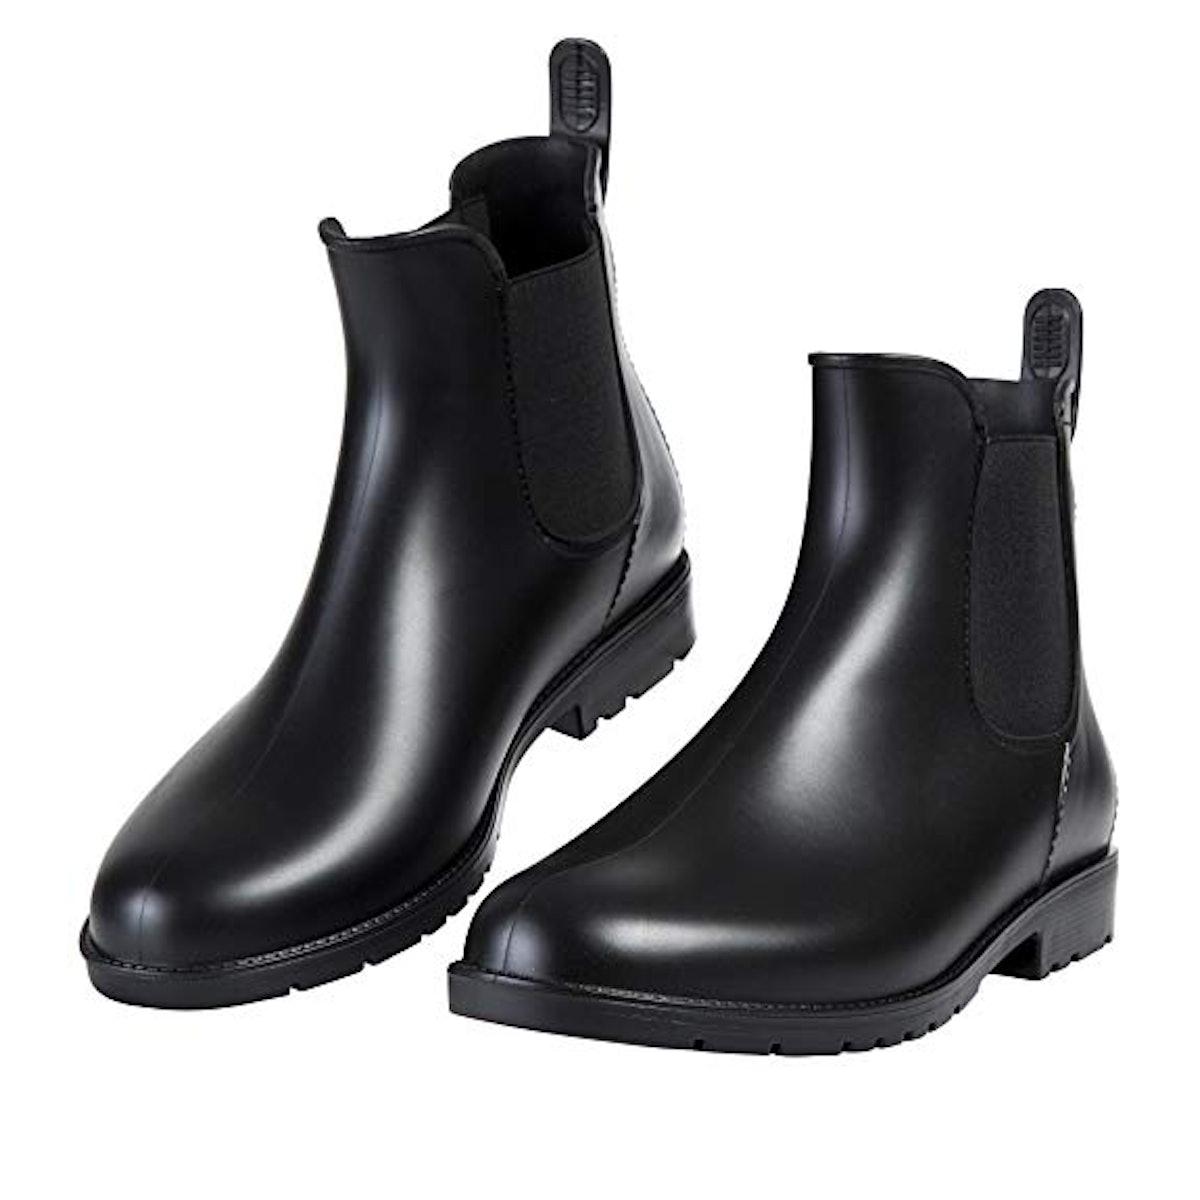 Asgard Women's Short Rain Boots